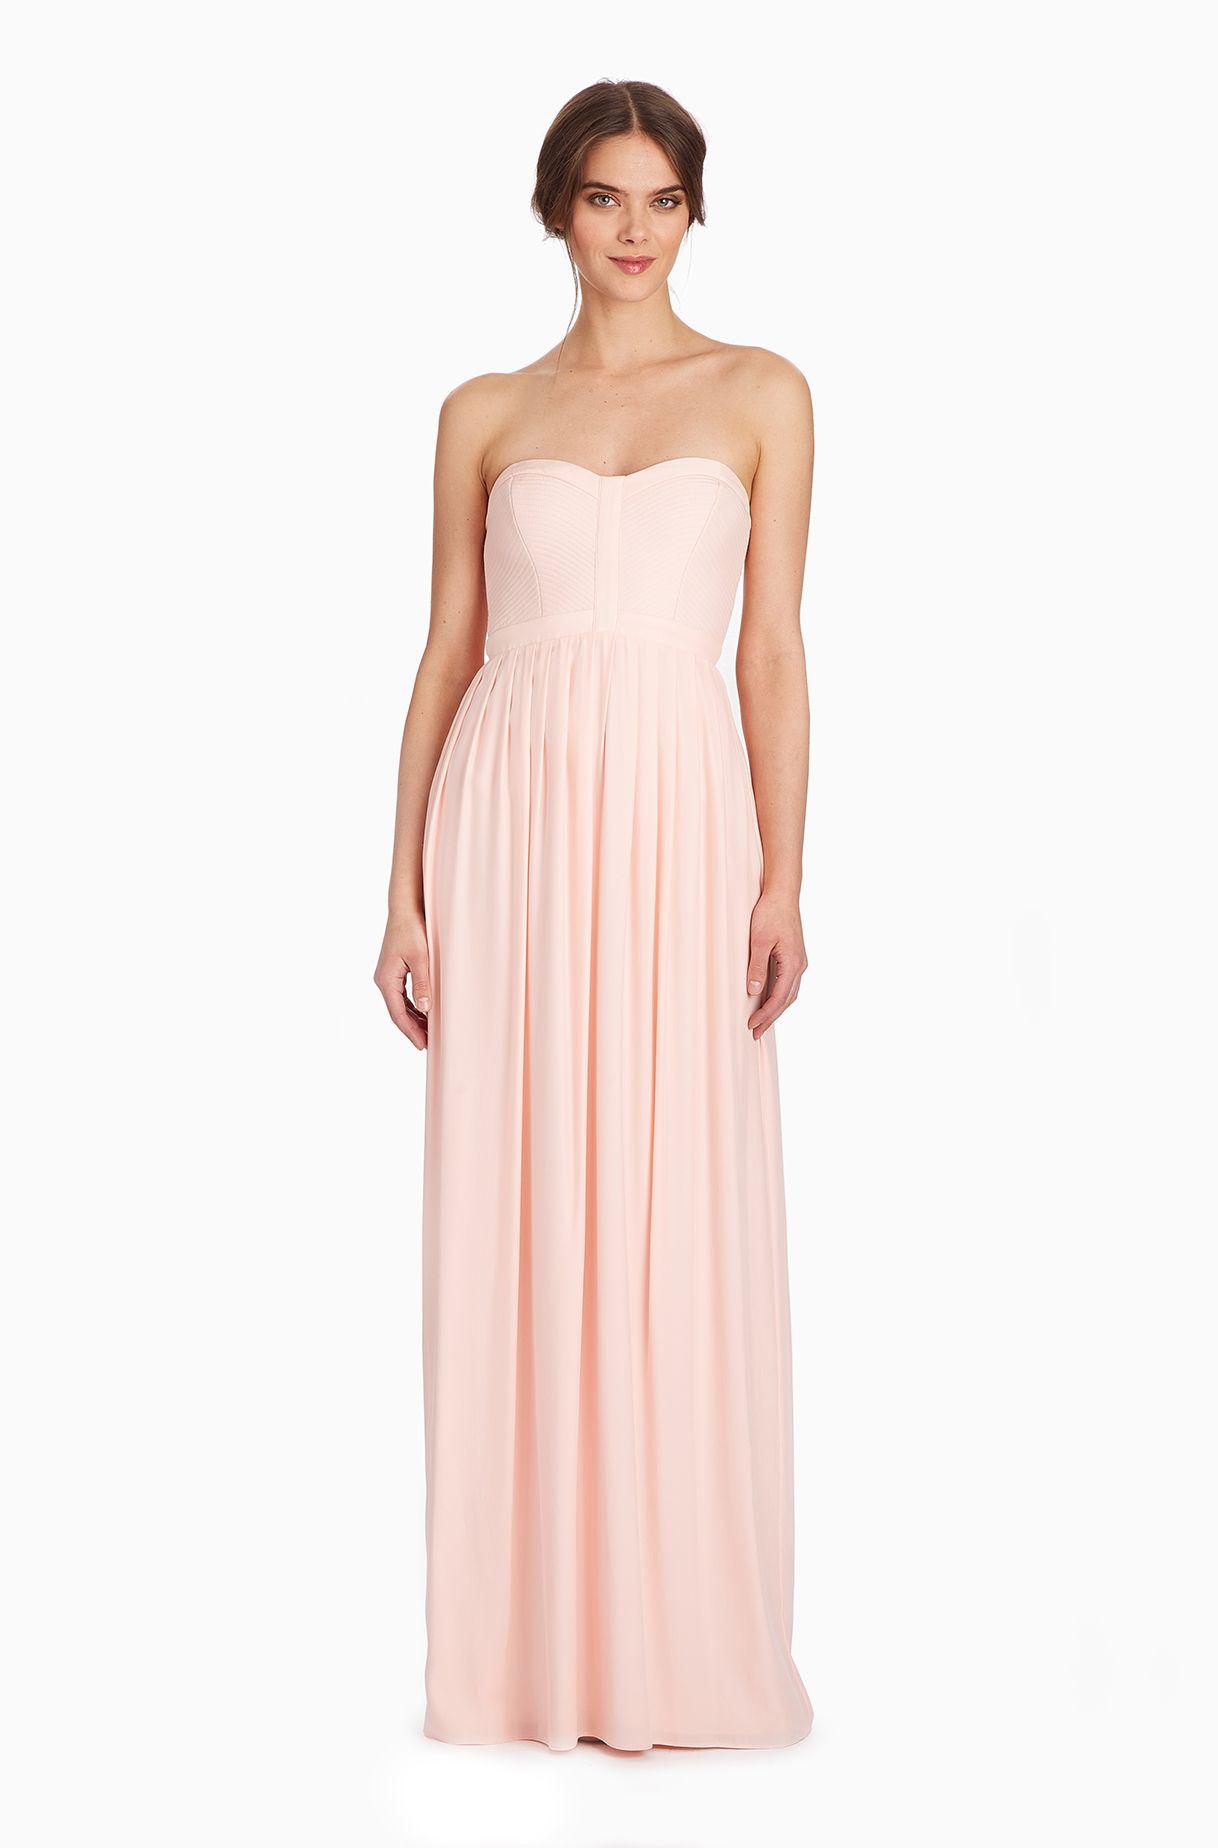 Bayou Night Prom Dress